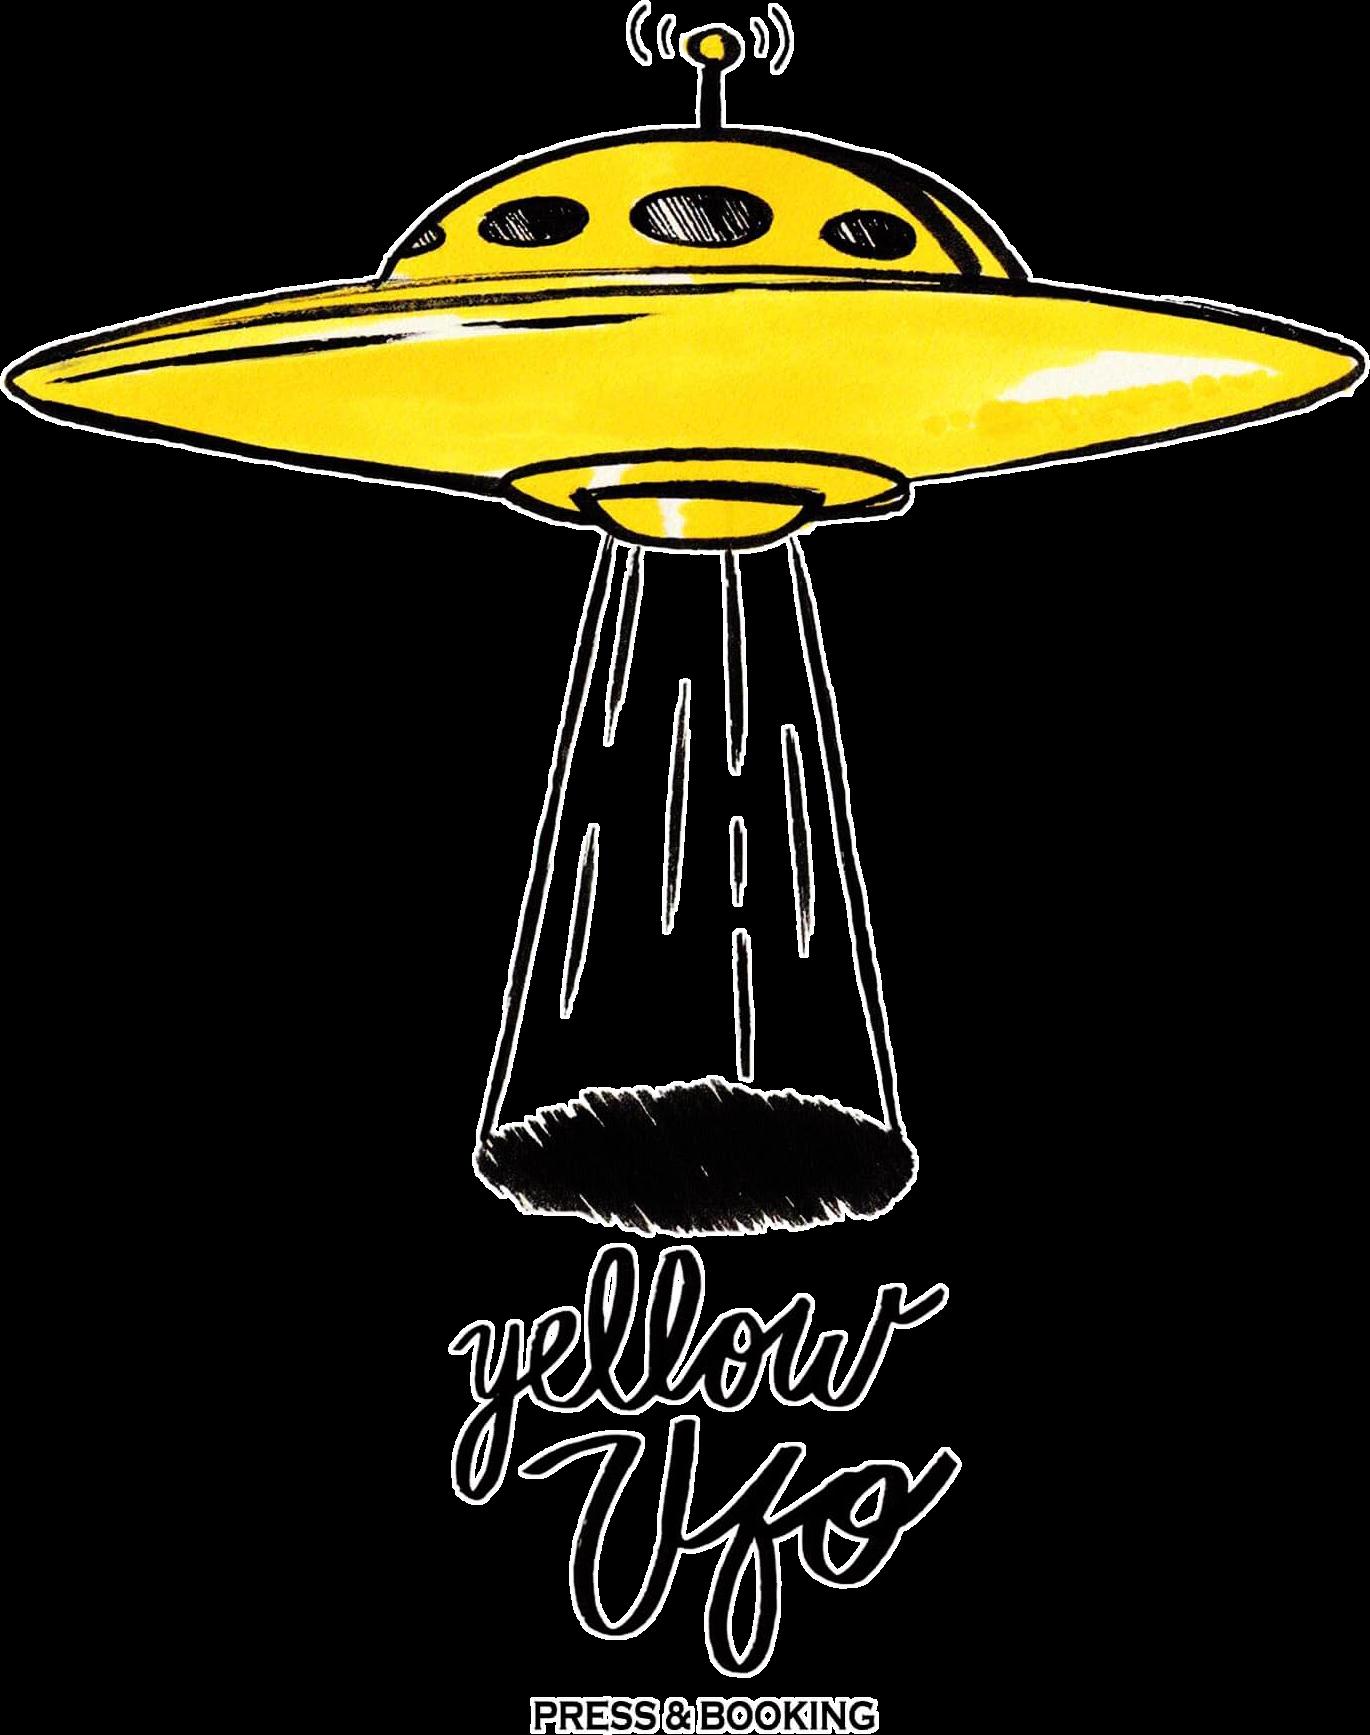 yellow ufo final transparent.png